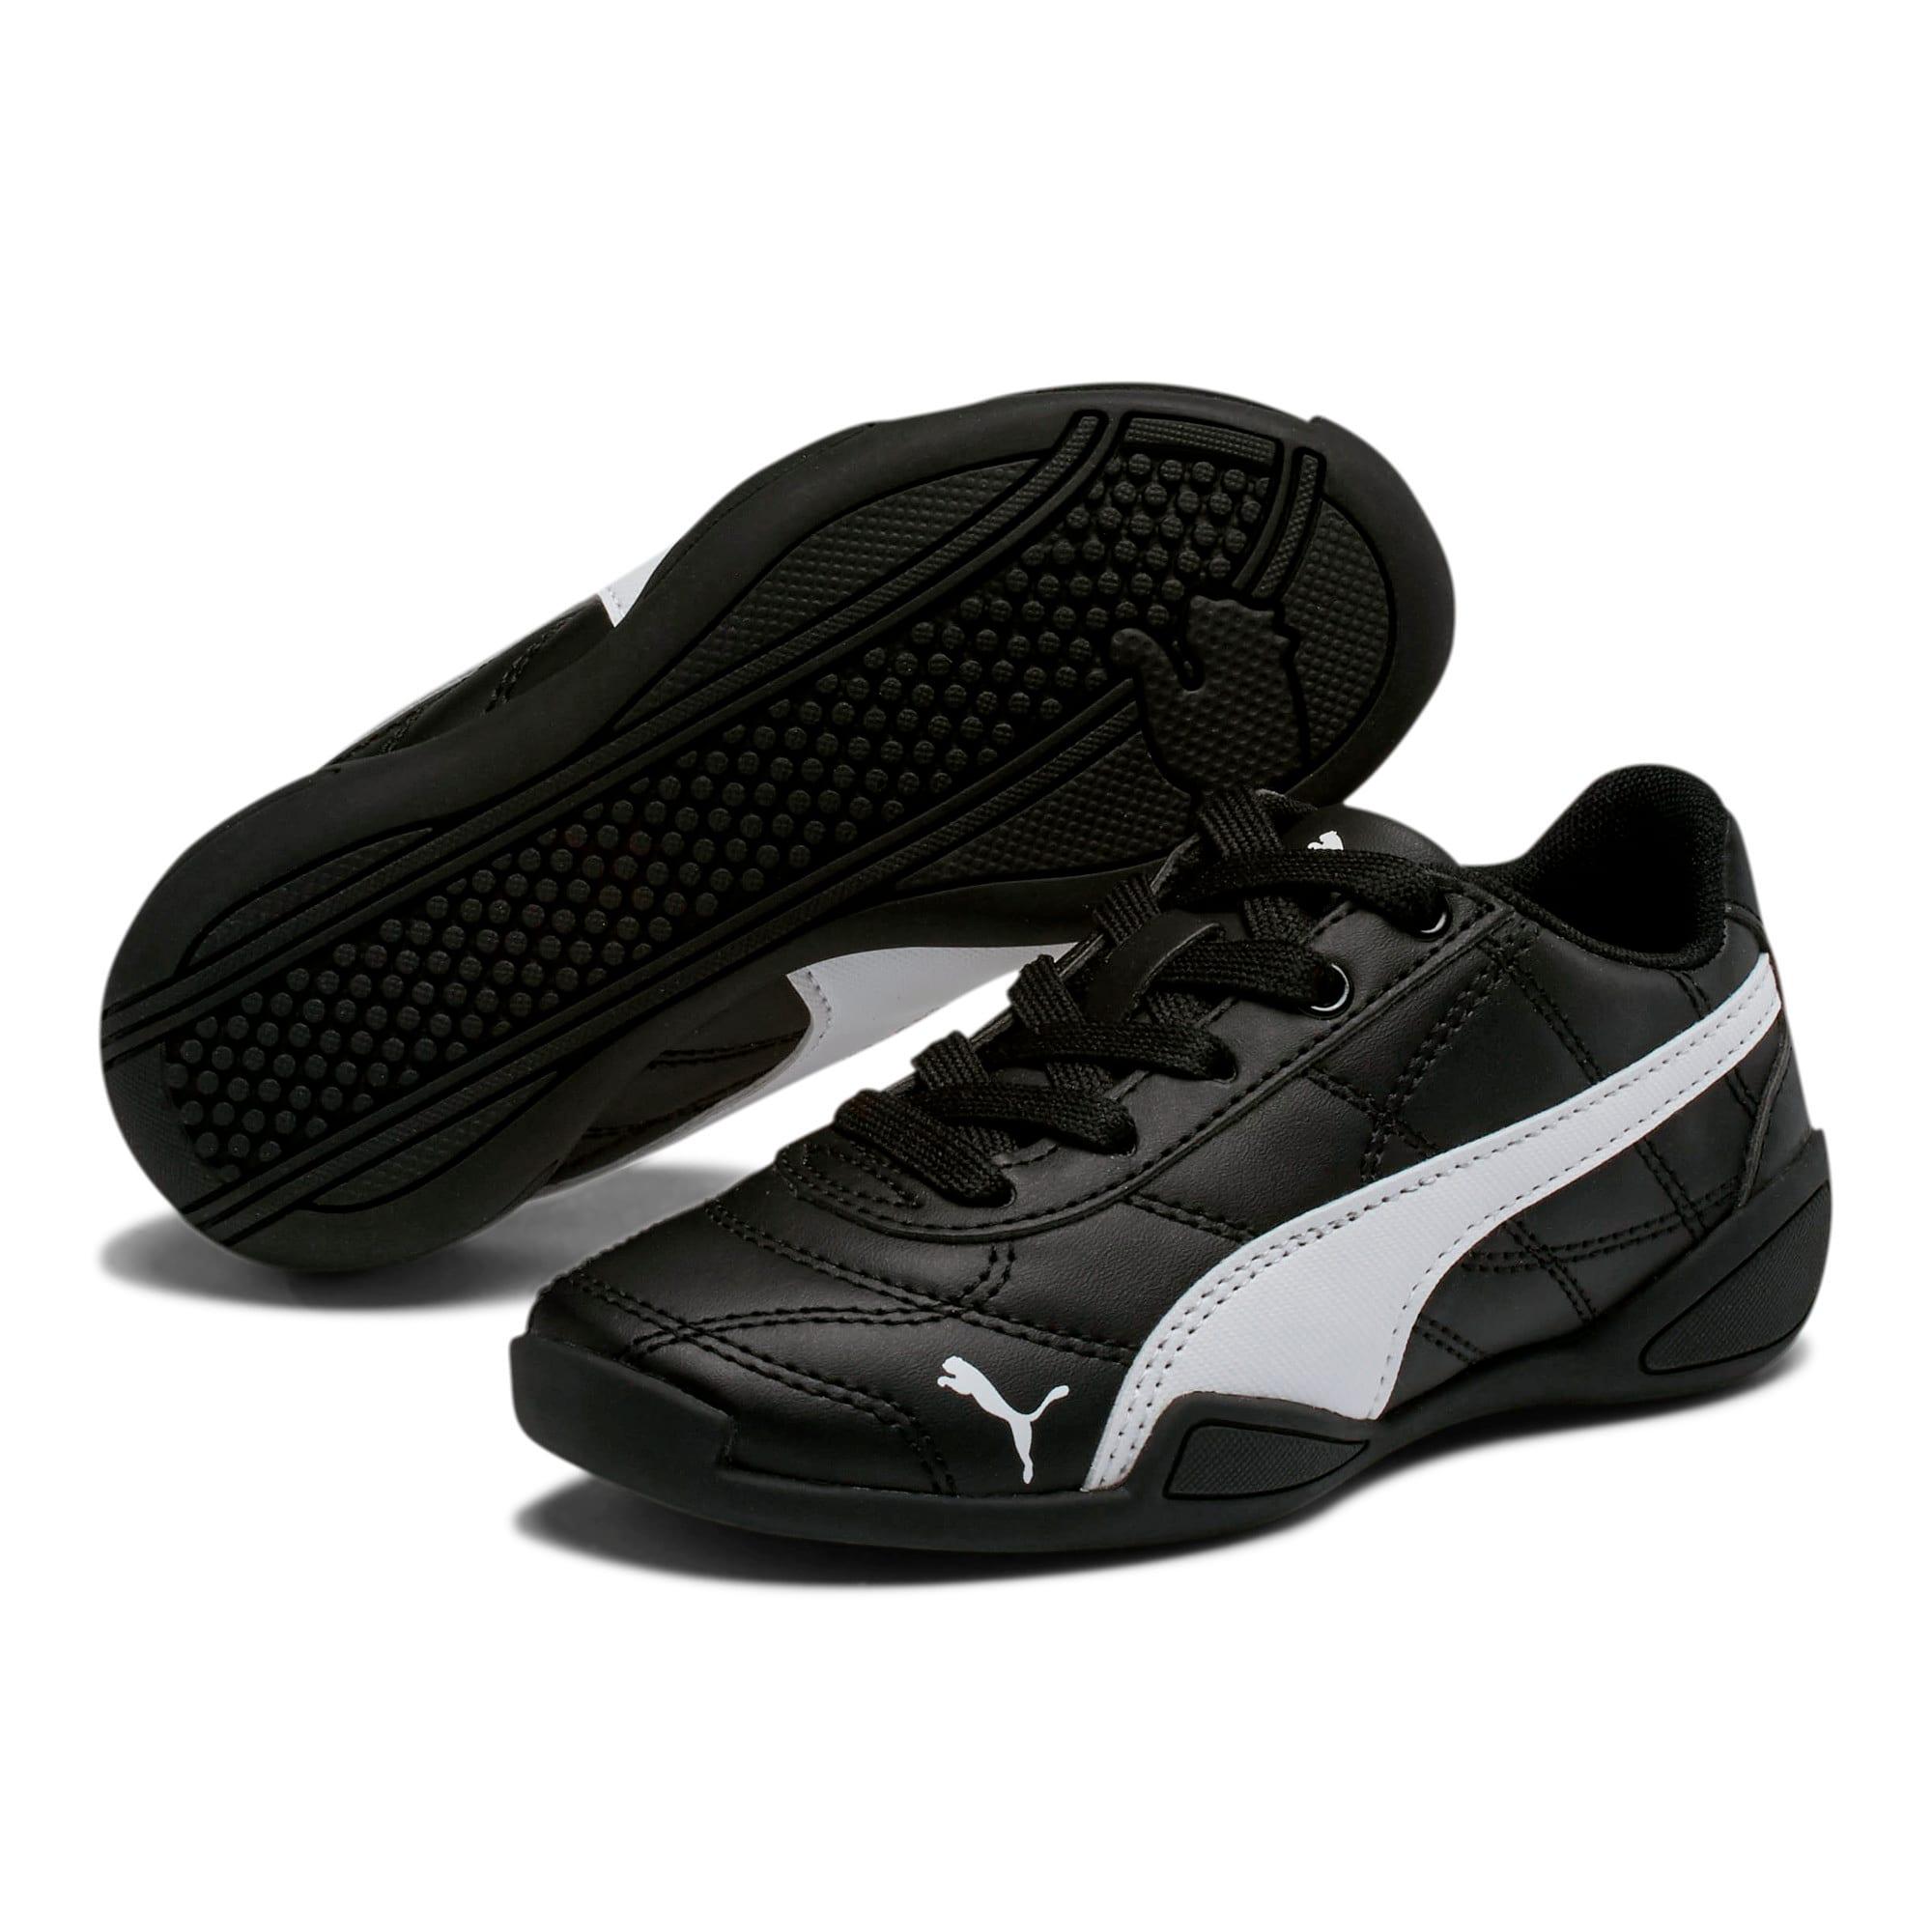 Thumbnail 2 of Tune Cat 3 Little Kids' Shoes, Puma Black-Puma White, medium